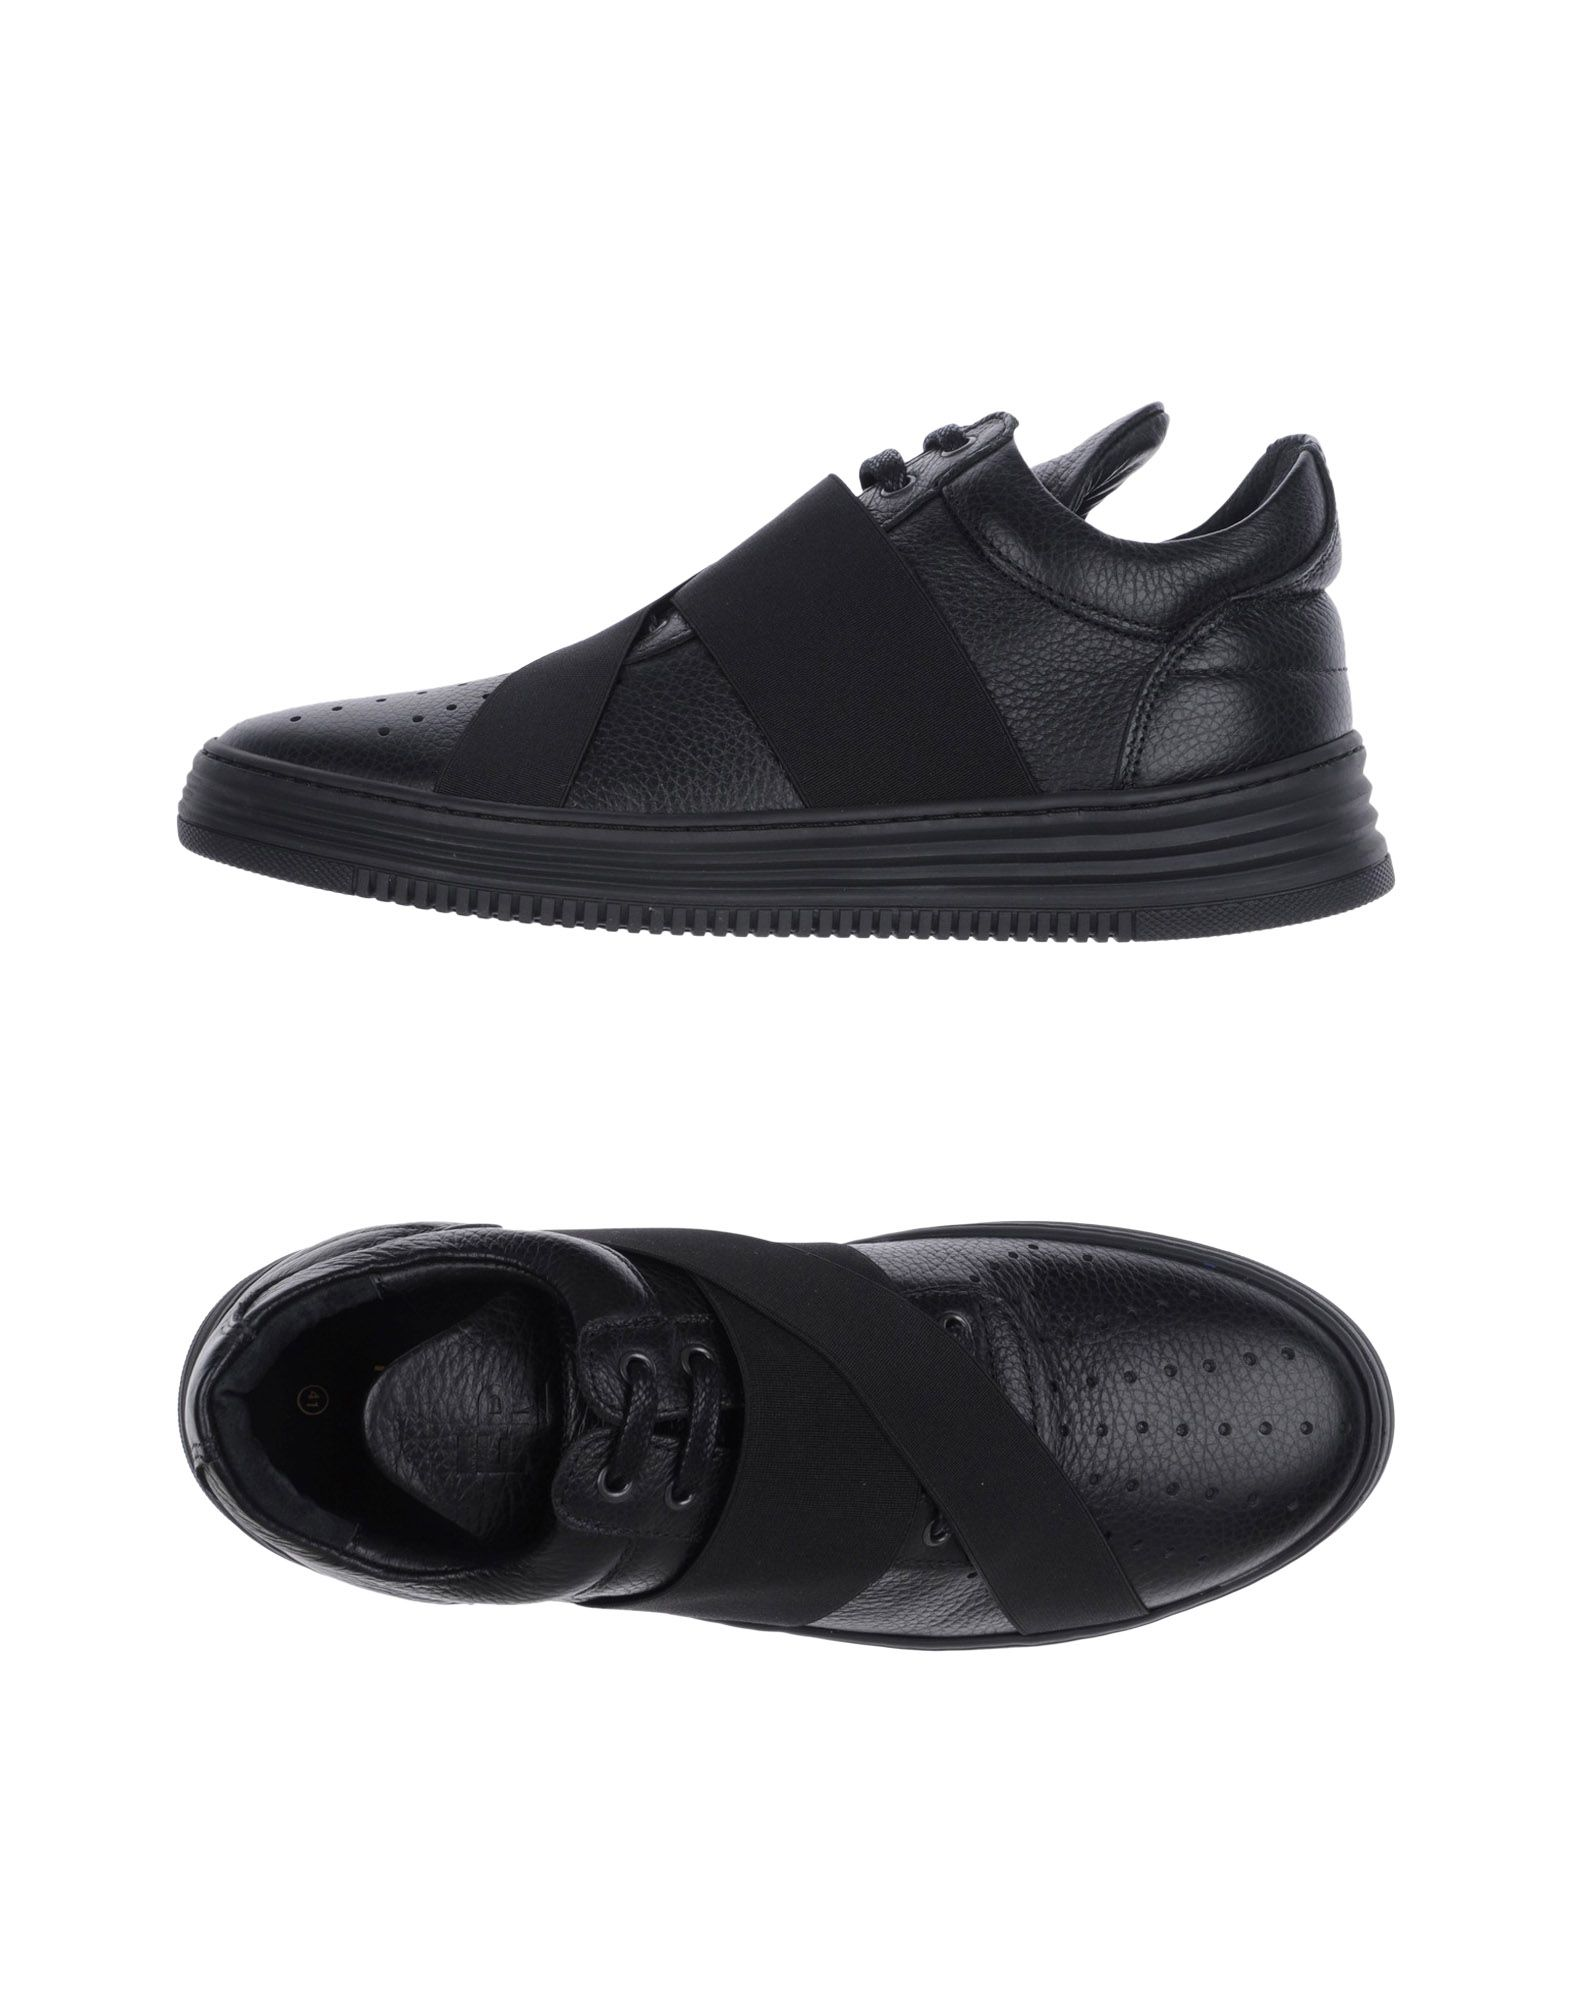 Sneakers Filling 11306093QI Pieces Uomo - 11306093QI Filling 9c6f82